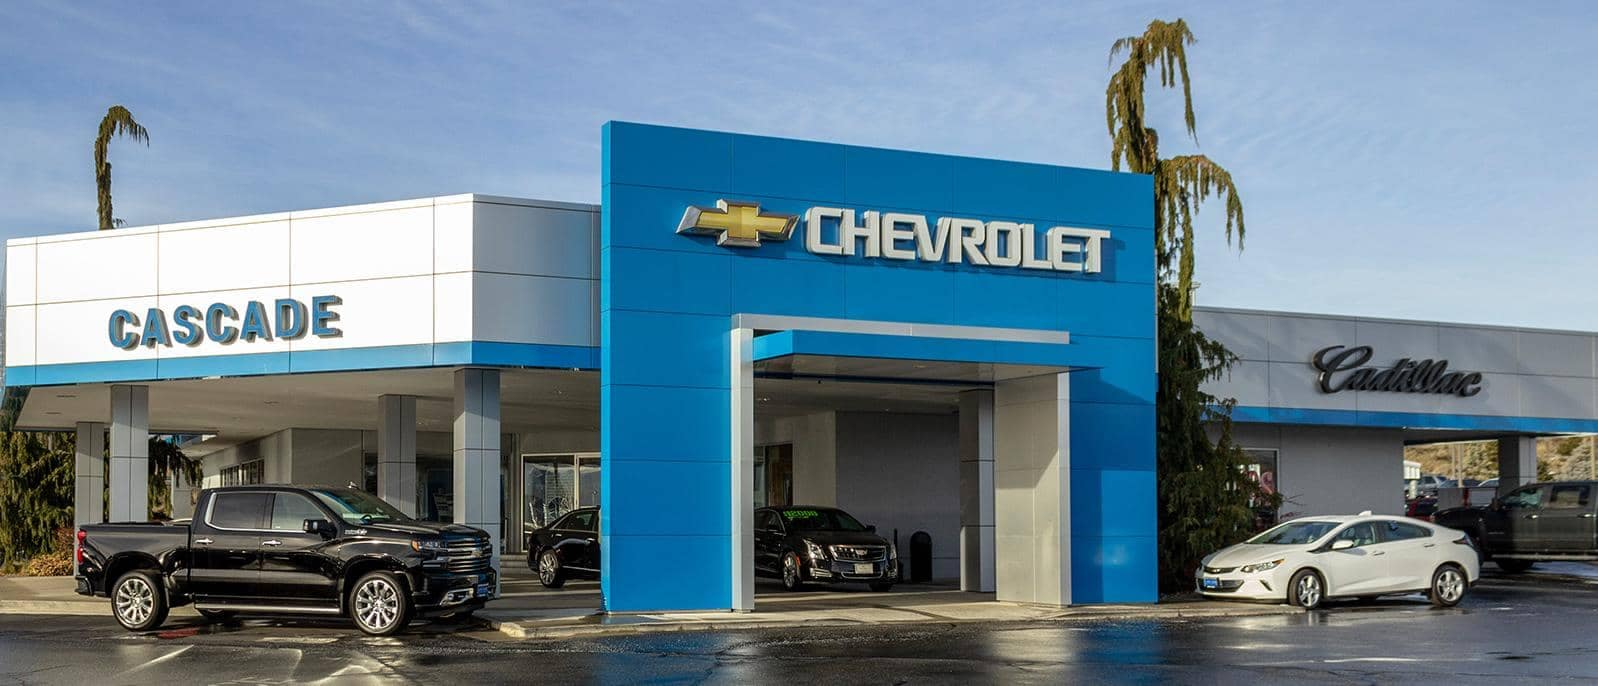 Cascade Chevrolet Dealership Front